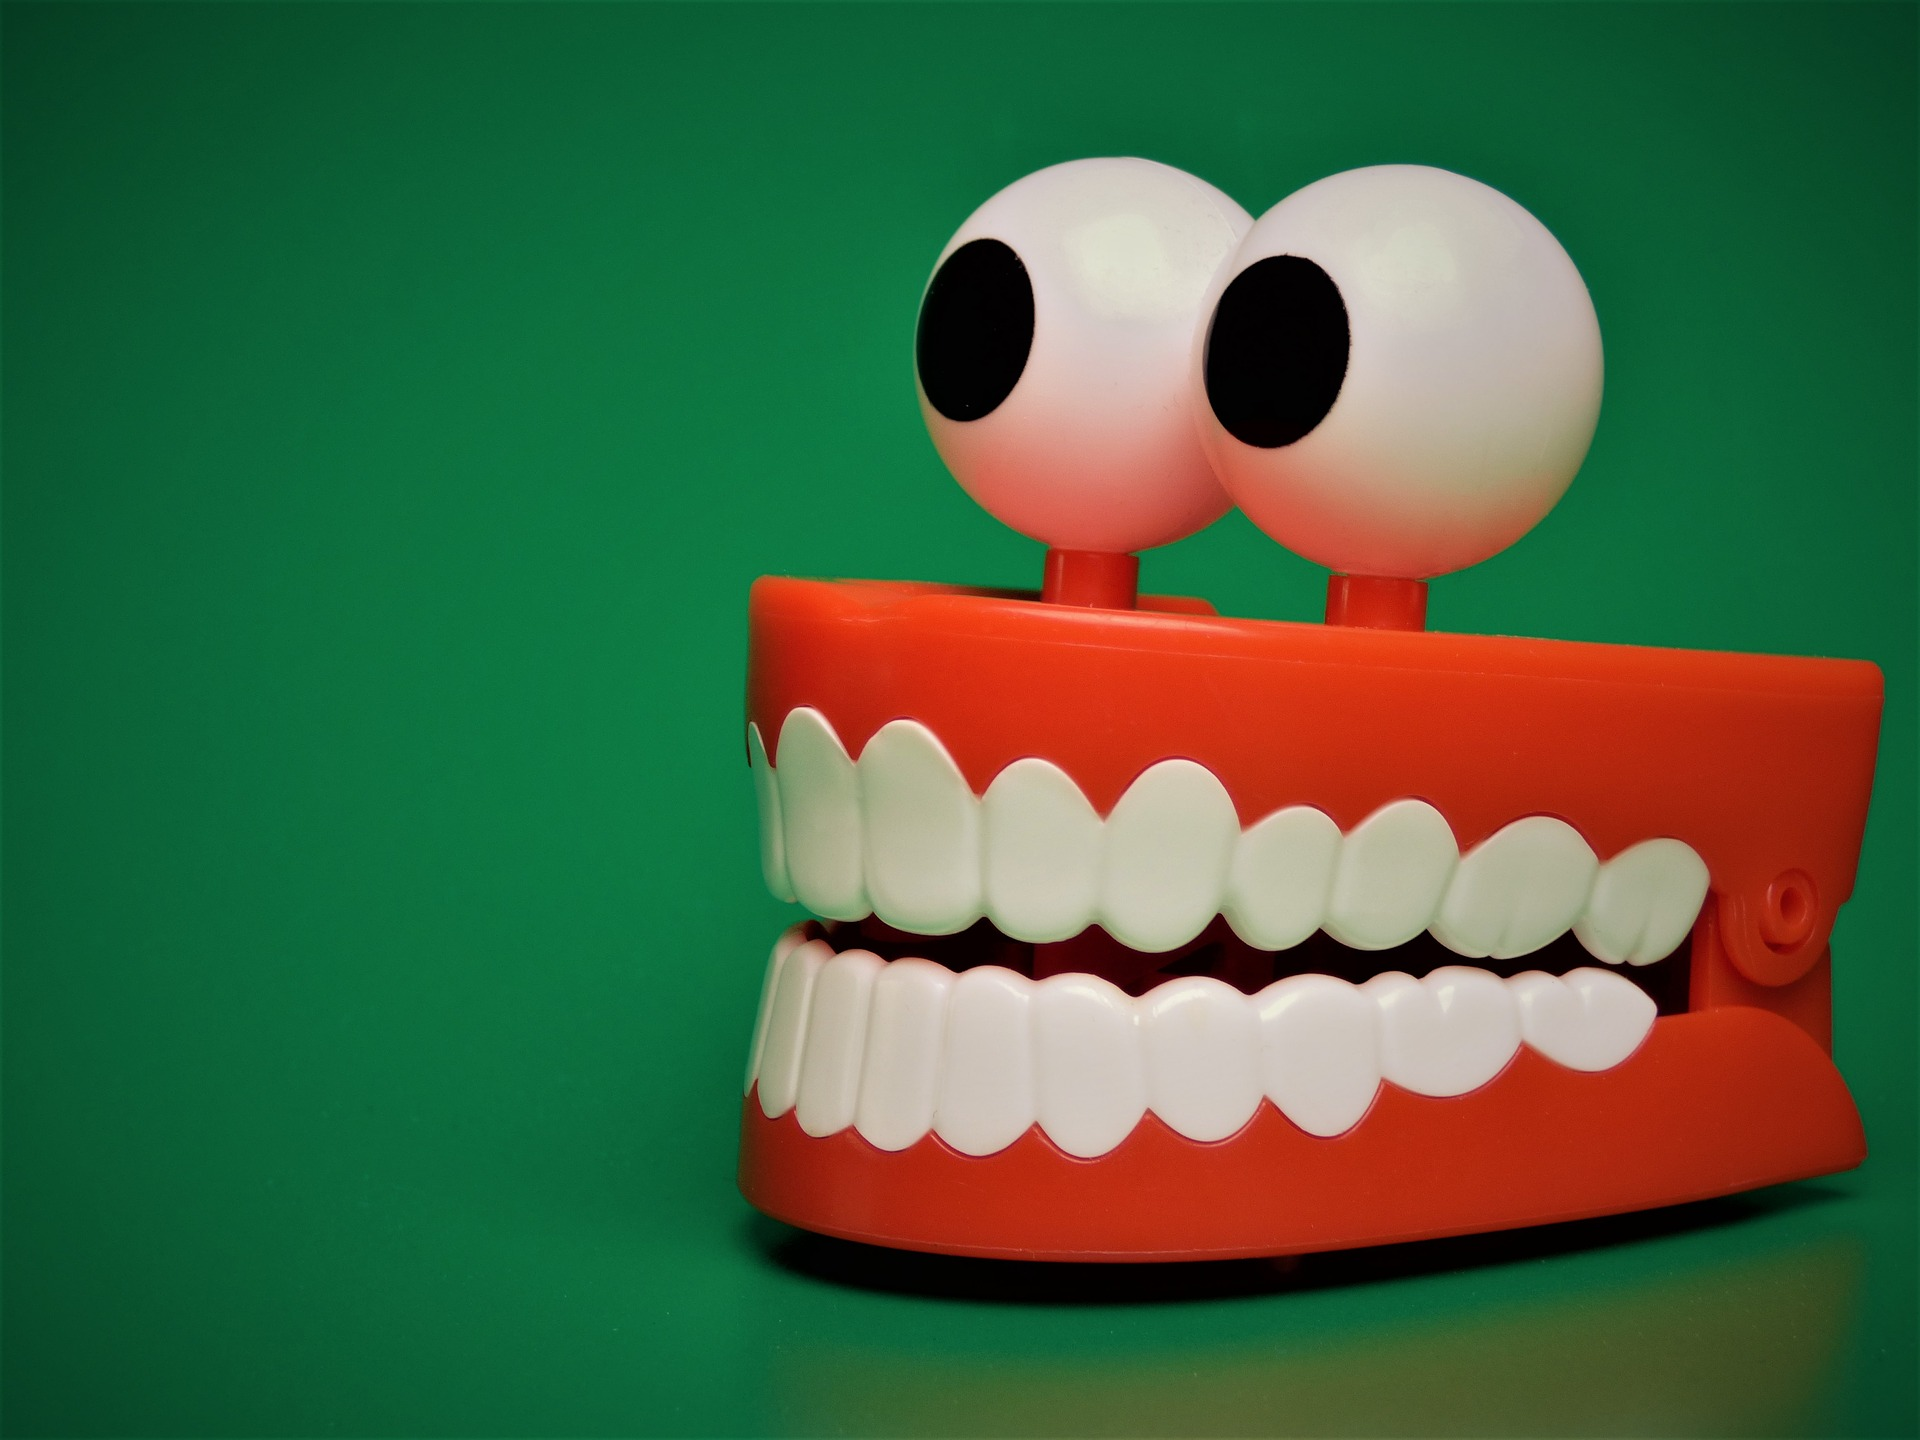 tooth-2013237_1920.jpg